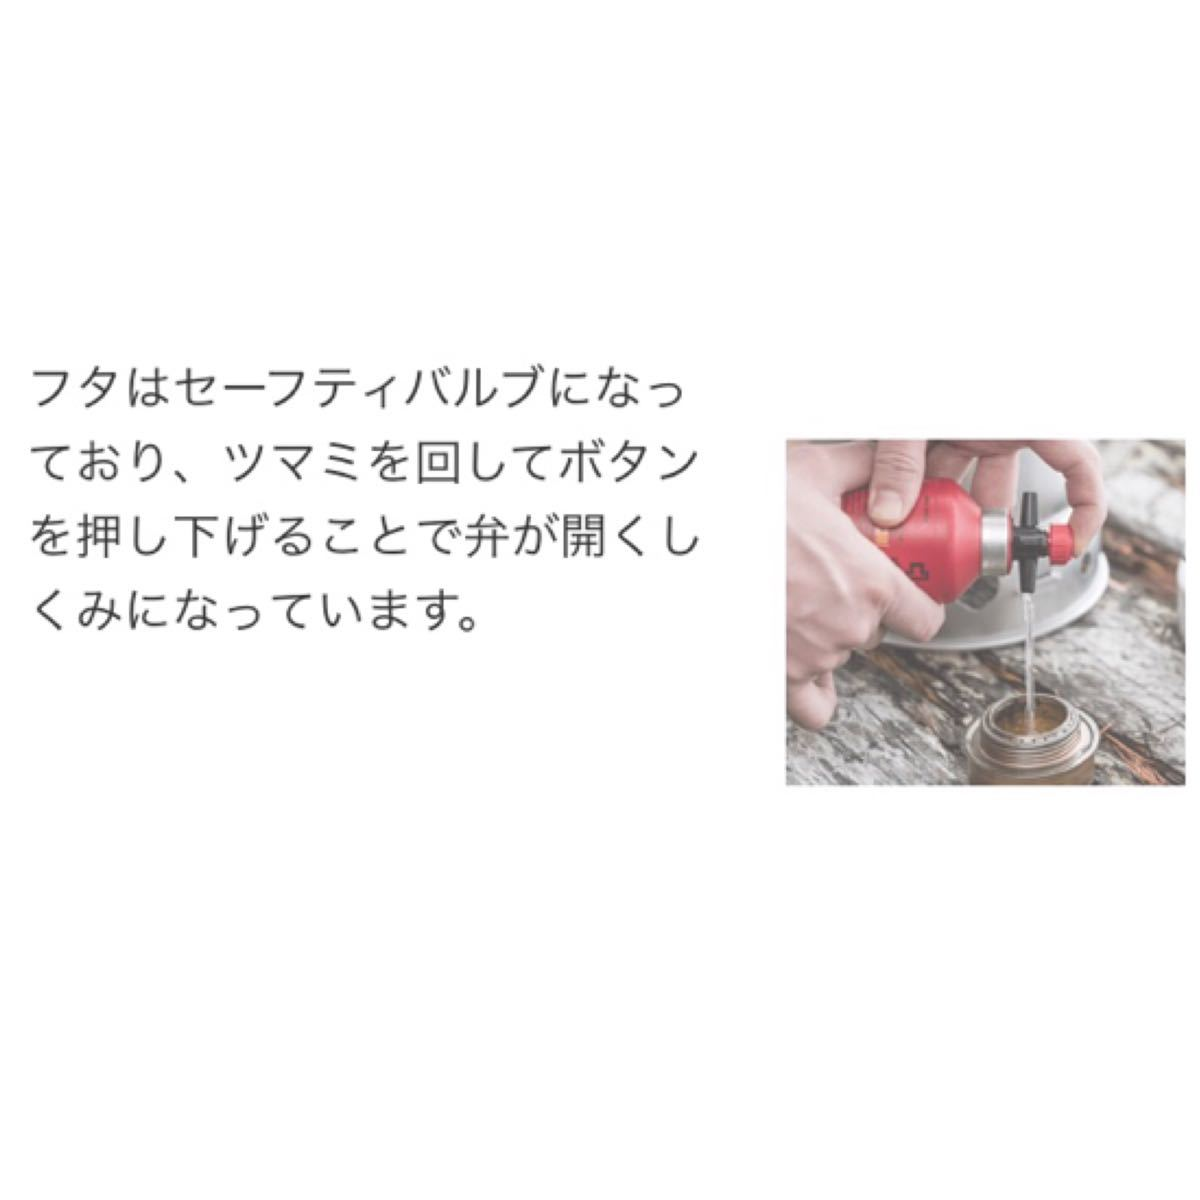 trangia トランギア フューエルボトル 0.3L 新品 燃料ボトル